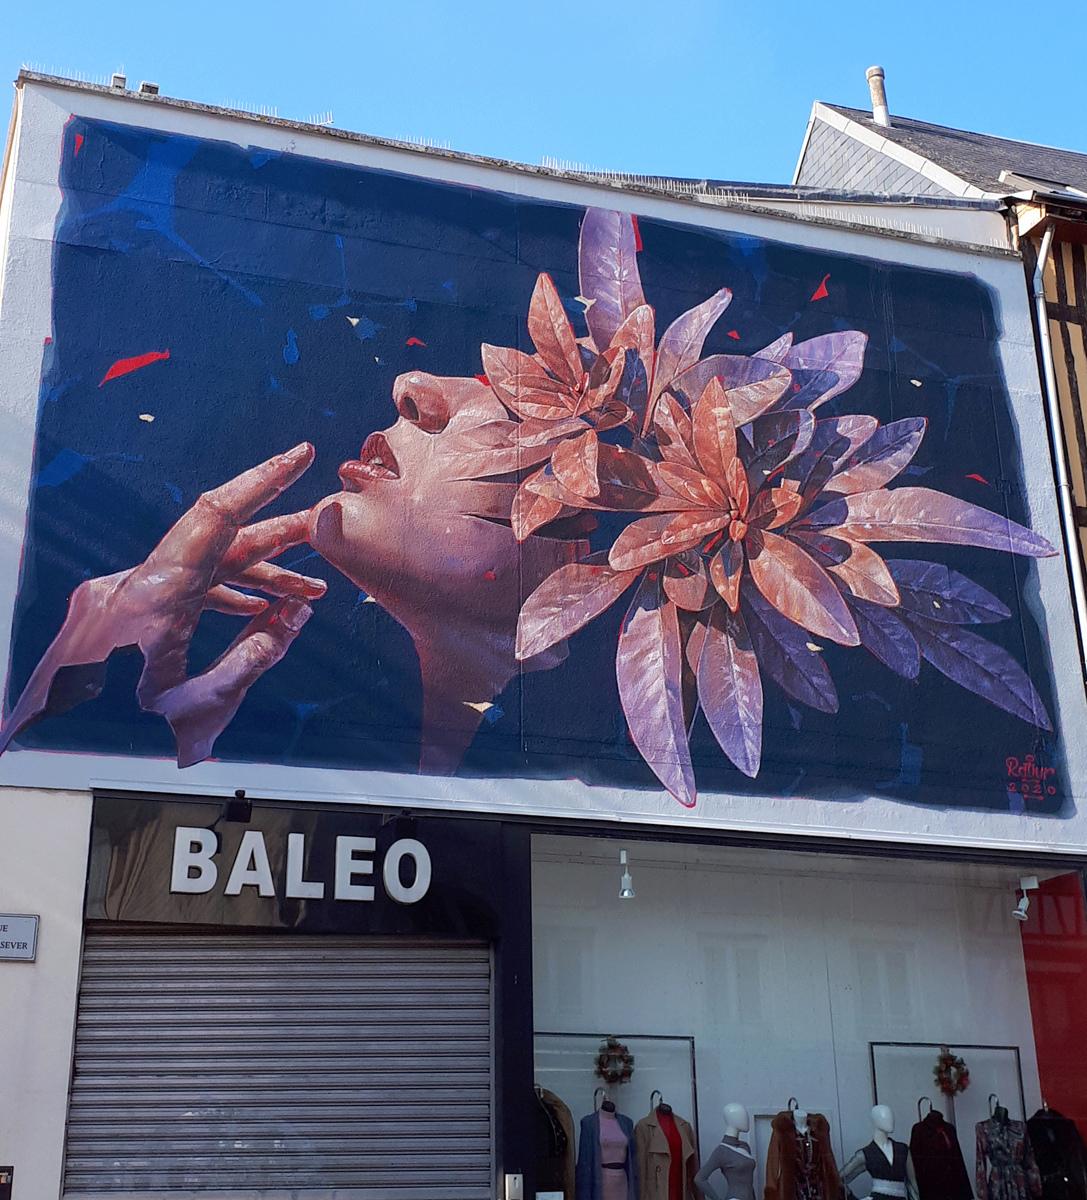 [street art-rue et manifs] ROUEN IMPRESSIONNEE 2020  20201021